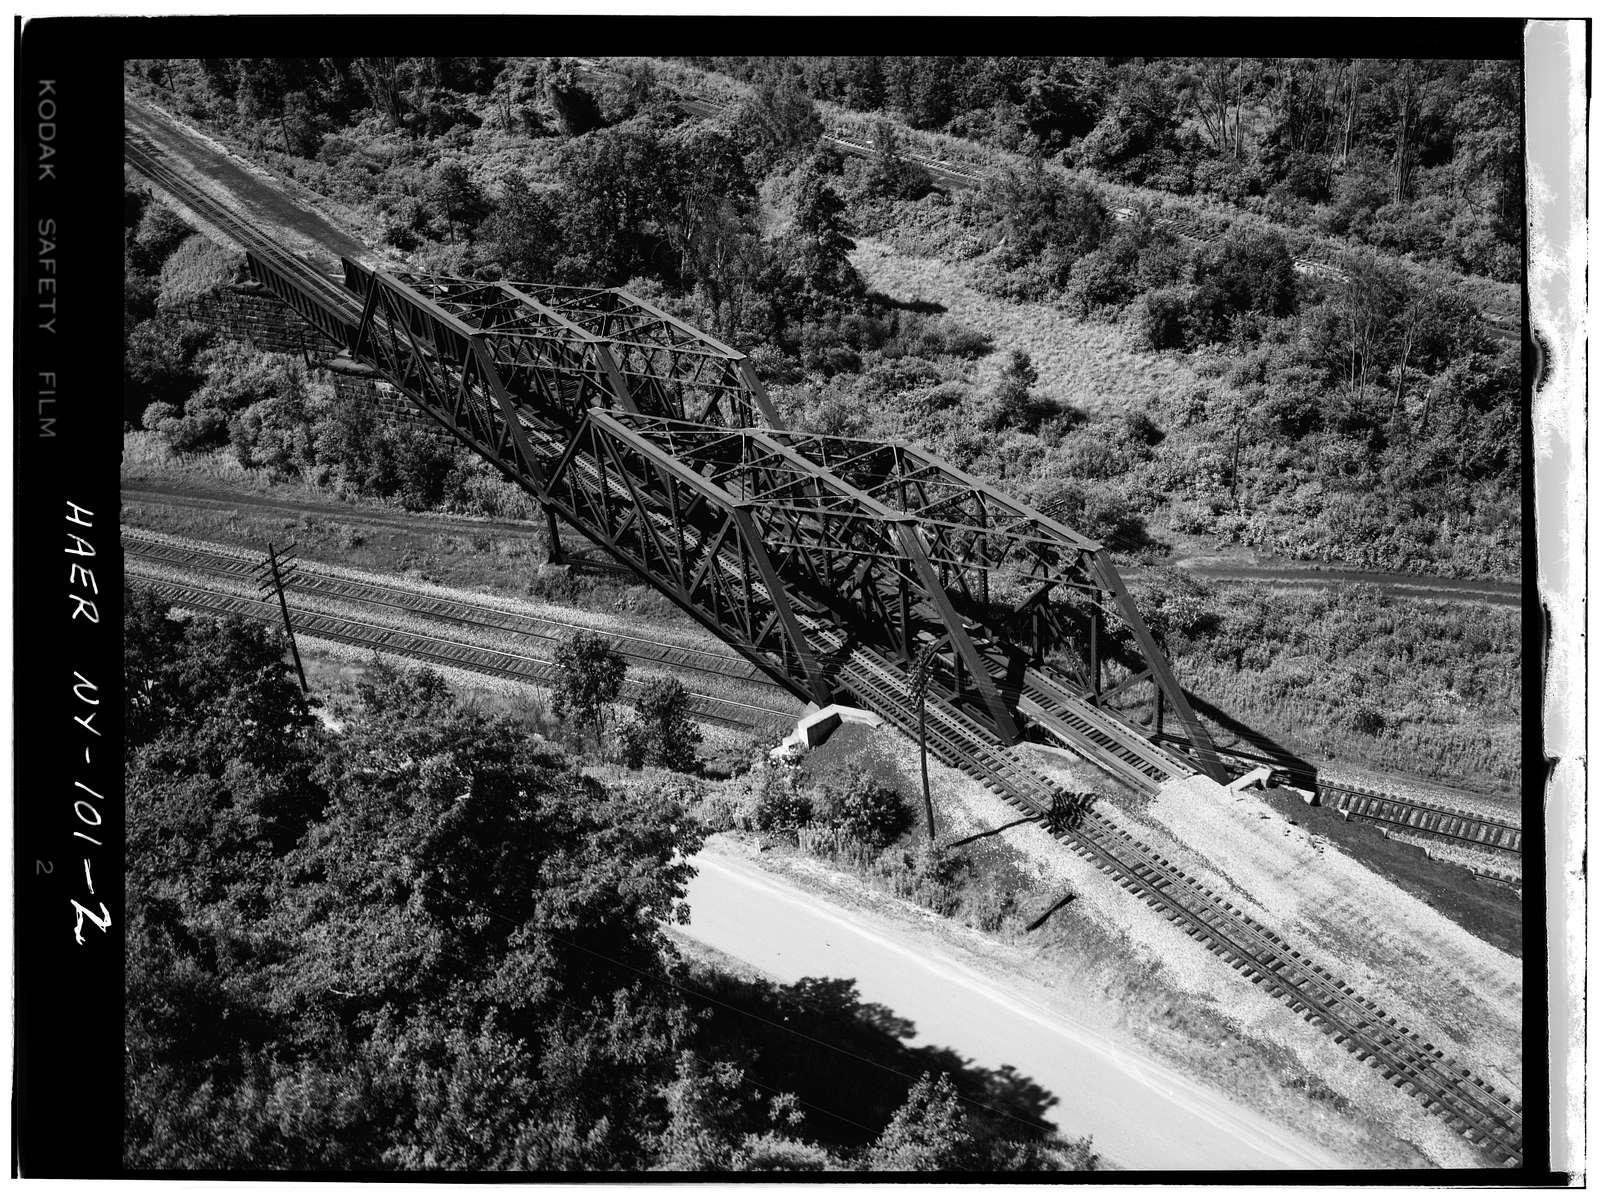 Baltimore & Ohio Railroad, Baltimore Skewed Thru-Truss Bridge, Salamanca, Cattaraugus County, NY